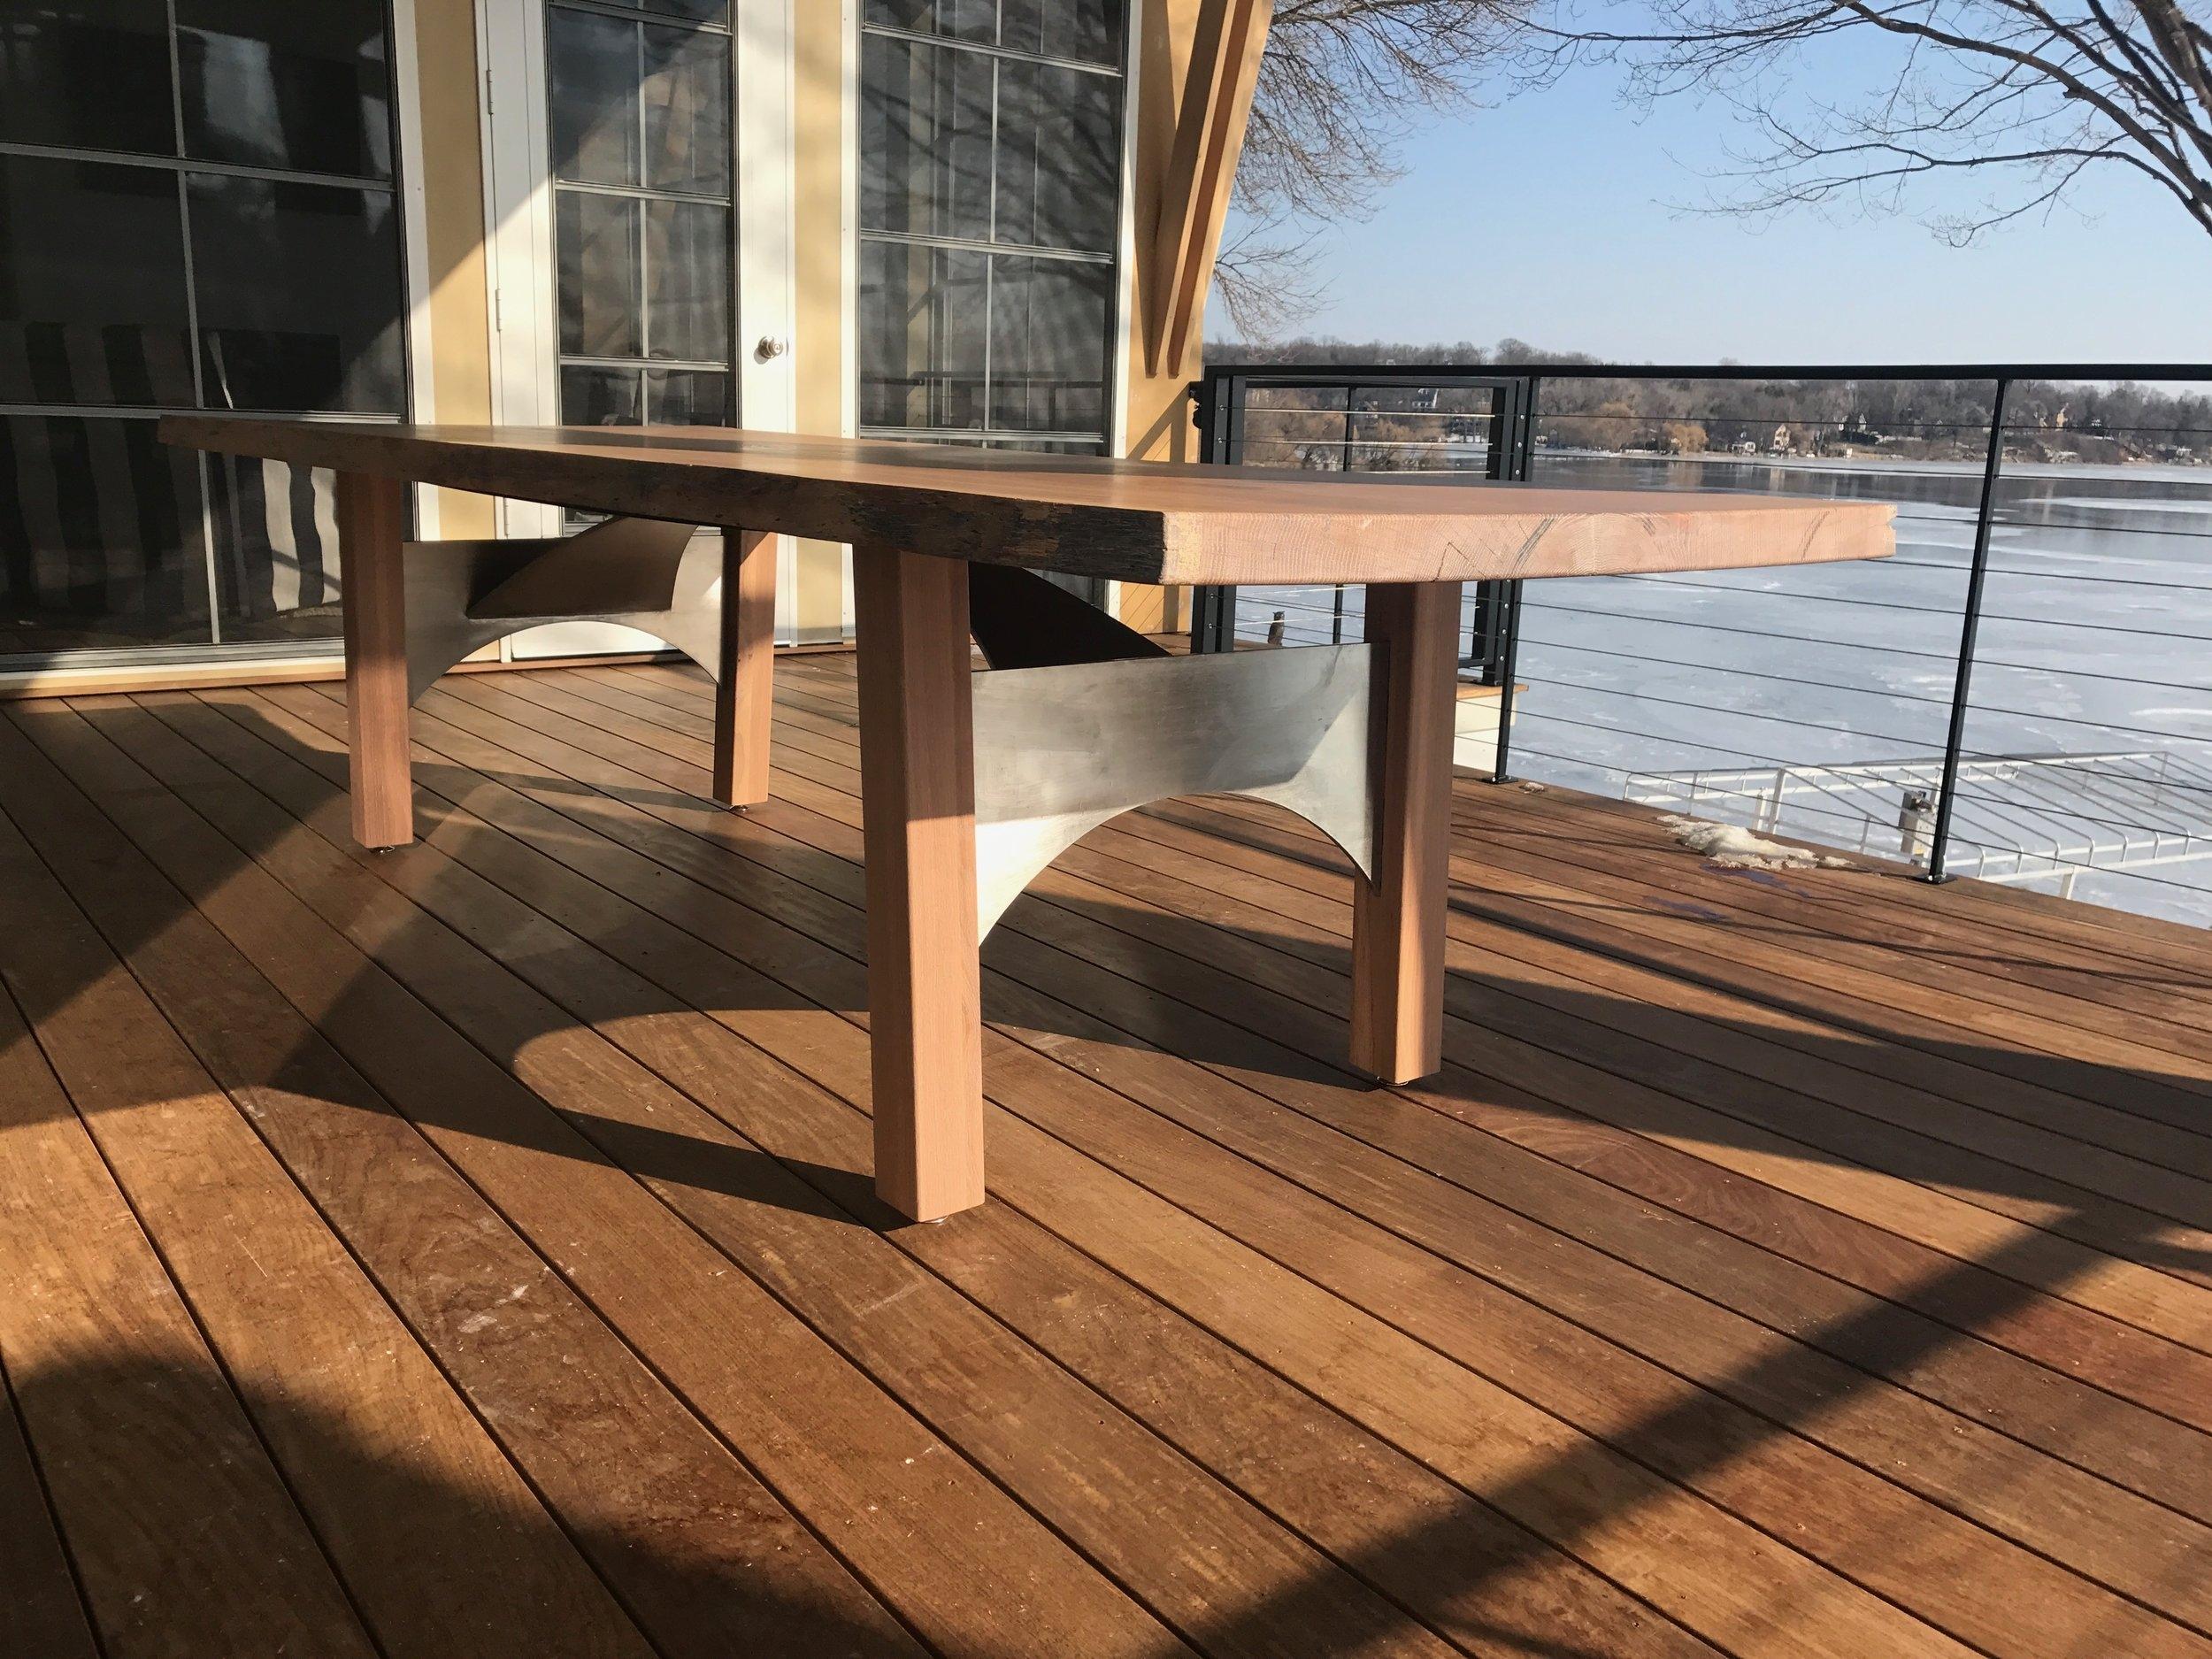 Bleached live edge white oak table